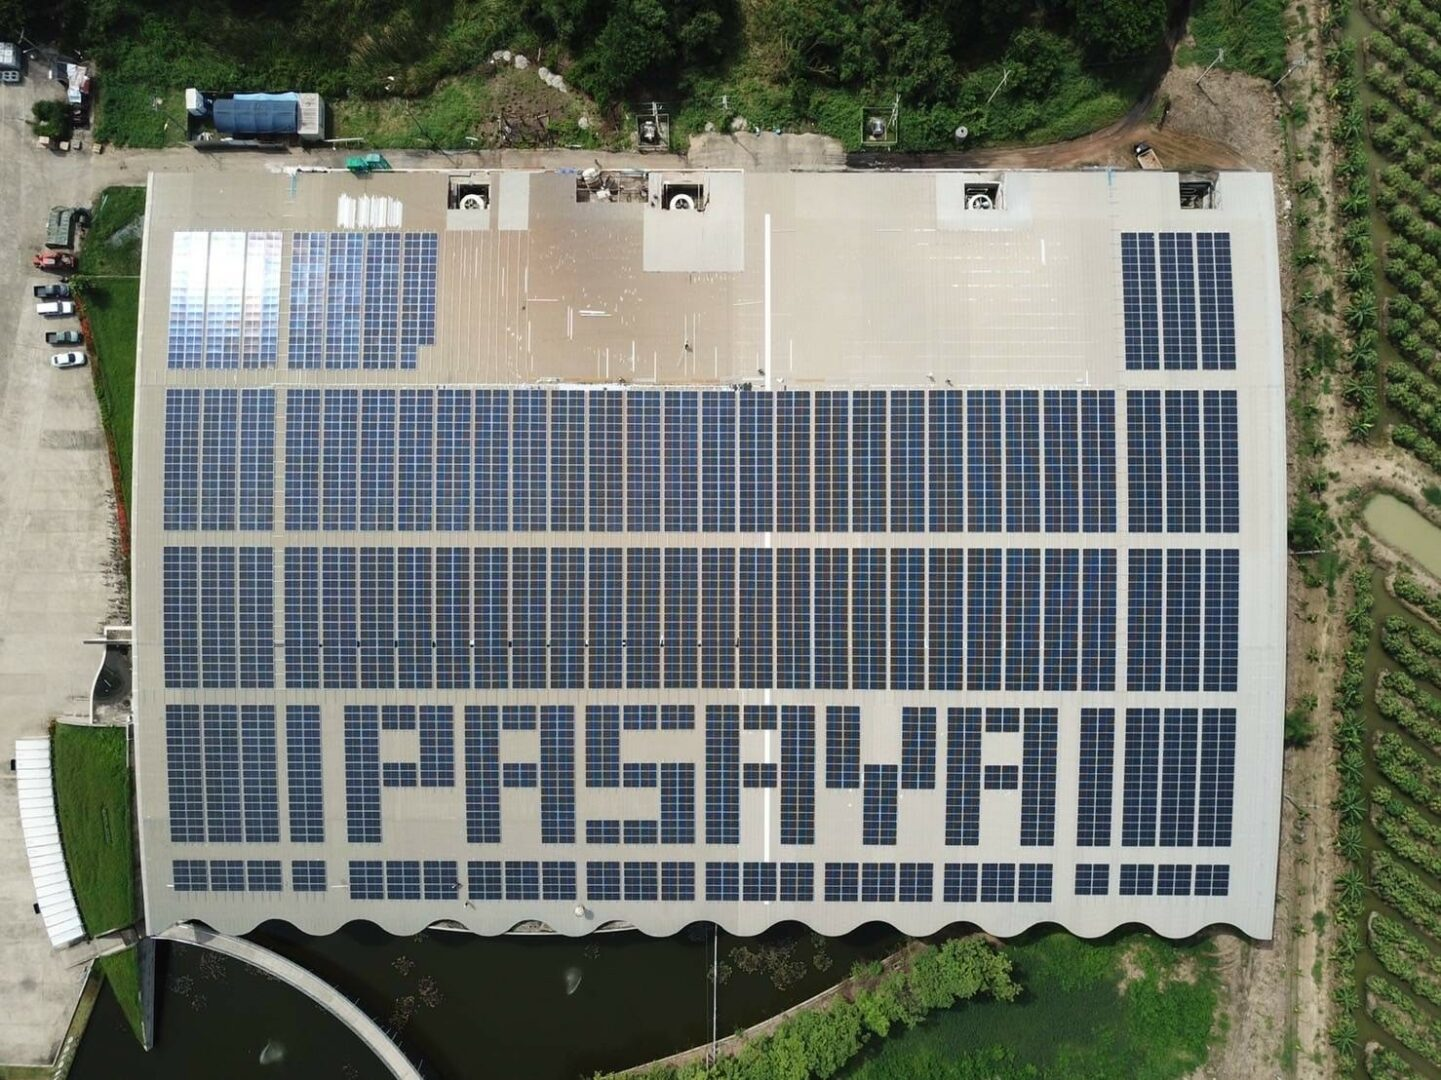 Solarchdach Pasaya